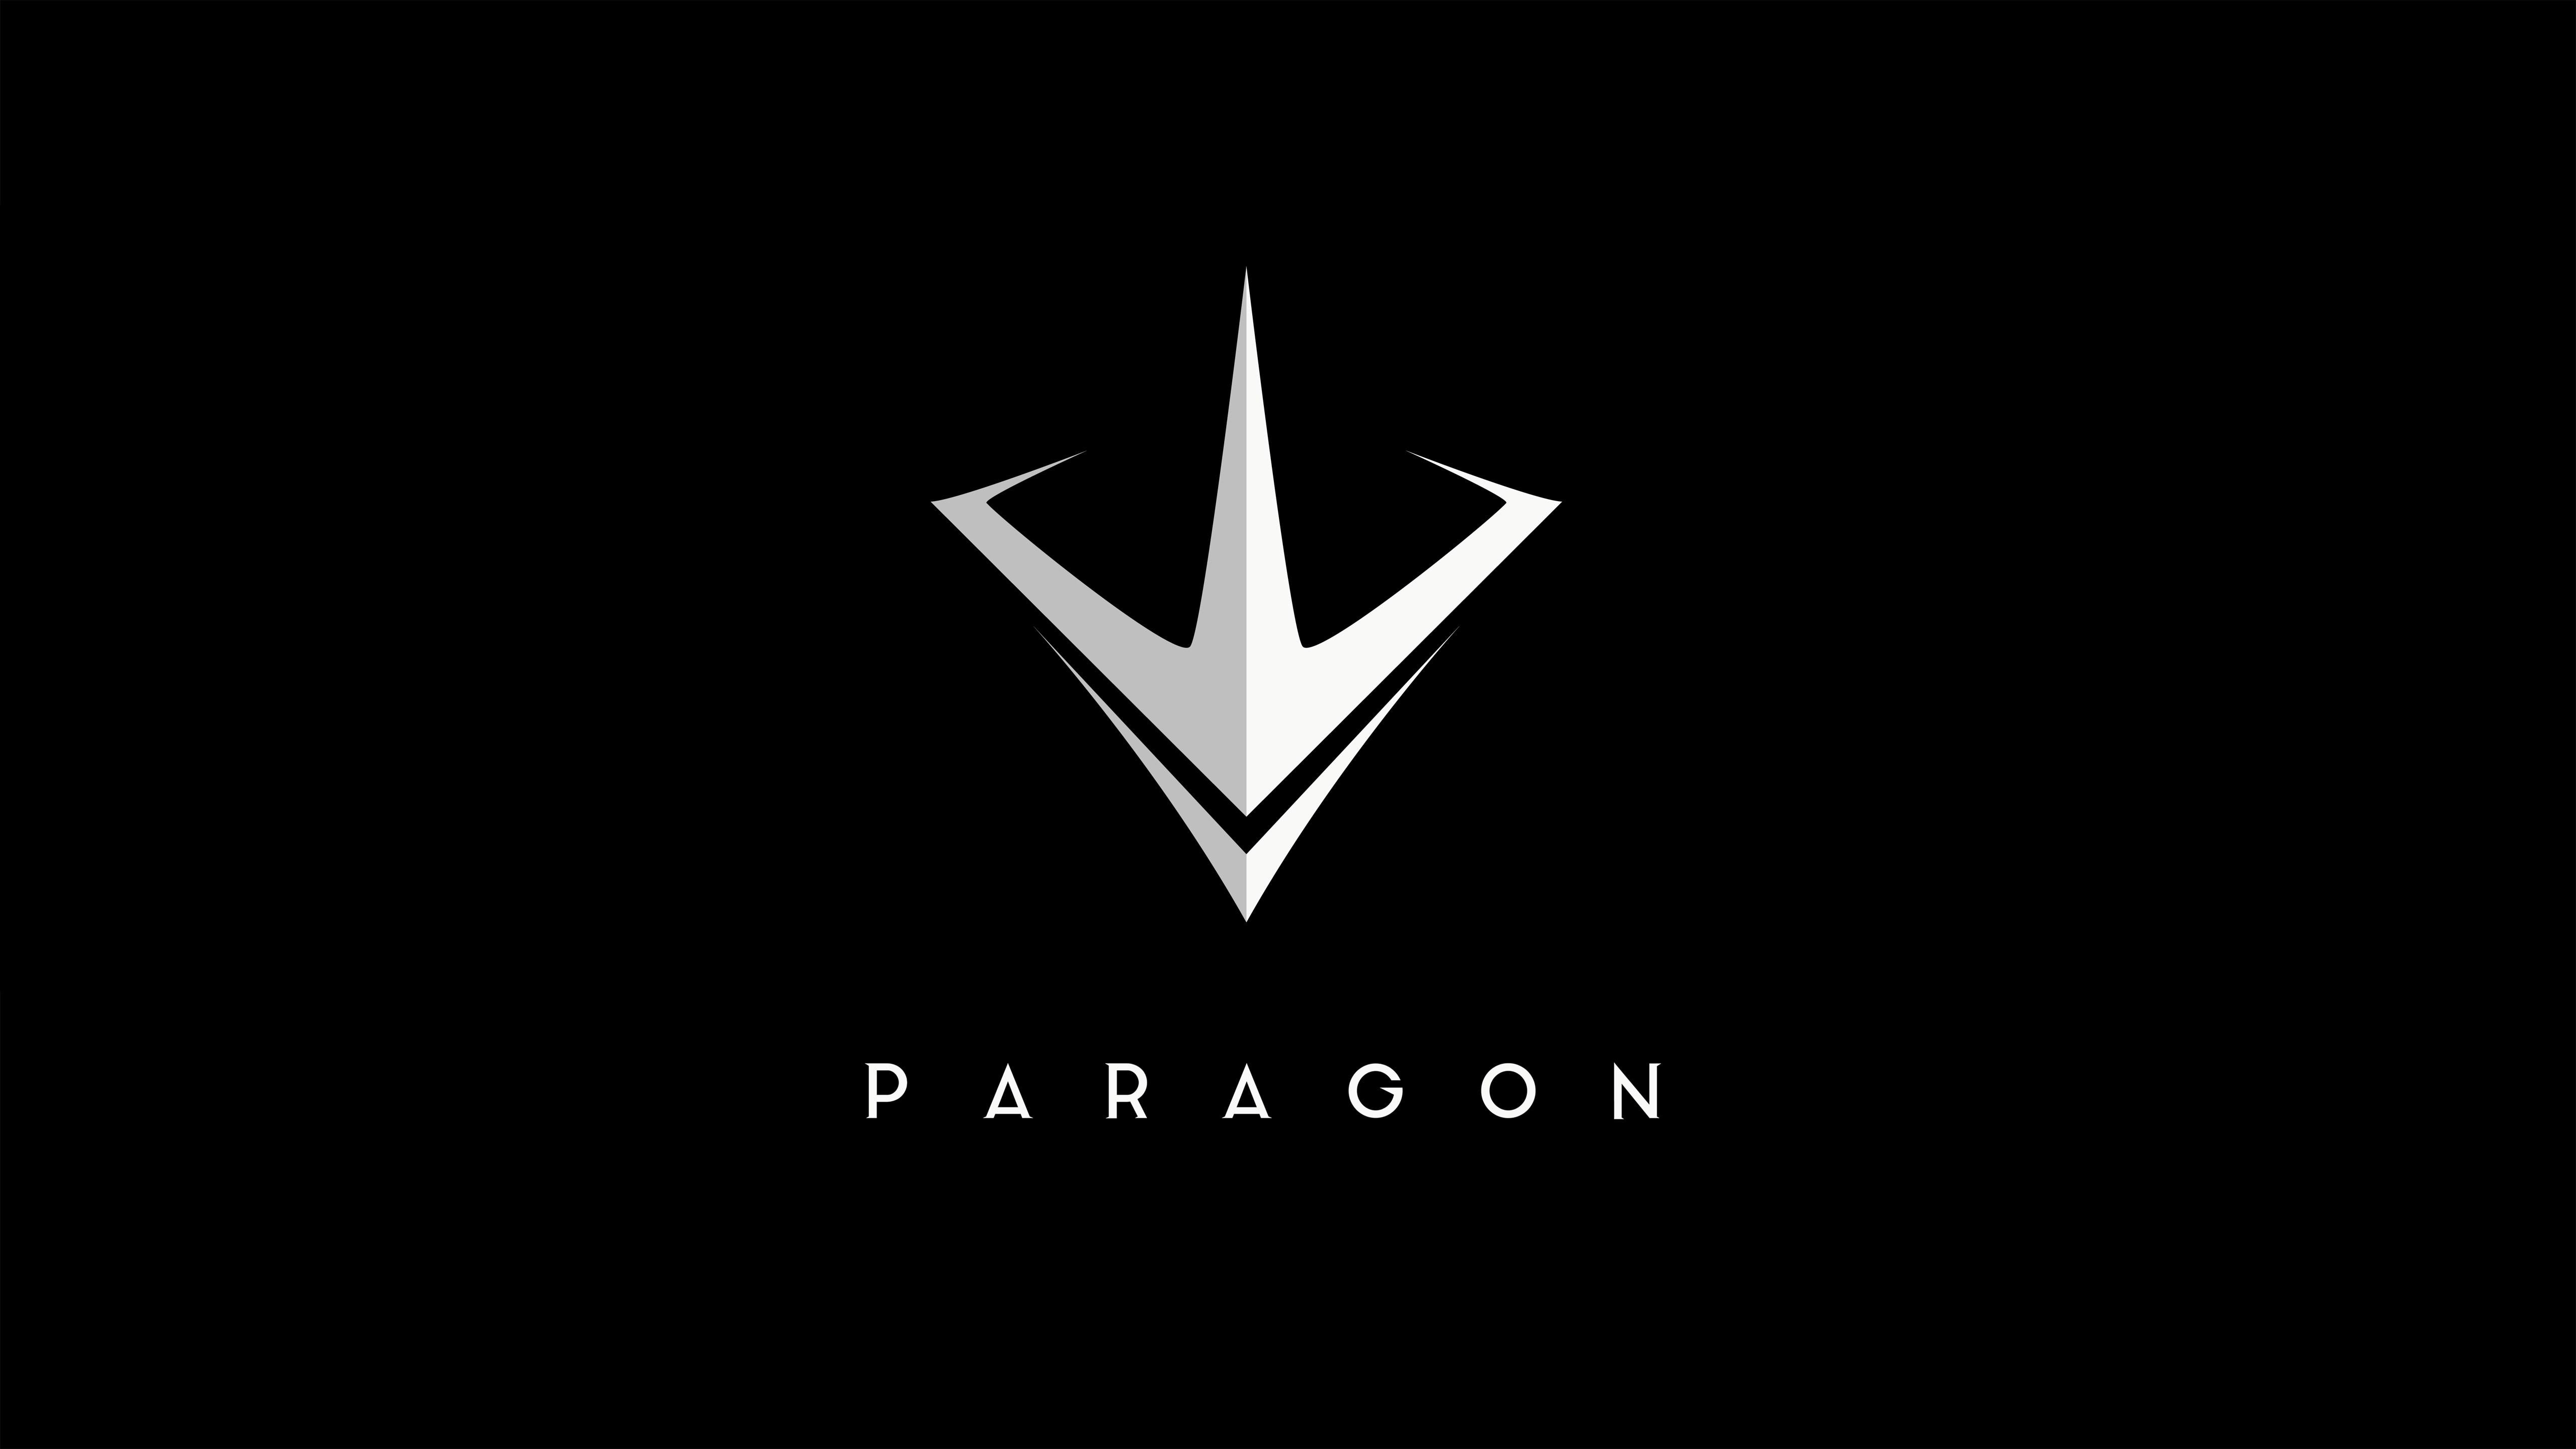 Wallpaper Paragon Logo Moba Best Games Pc Ps4 Games